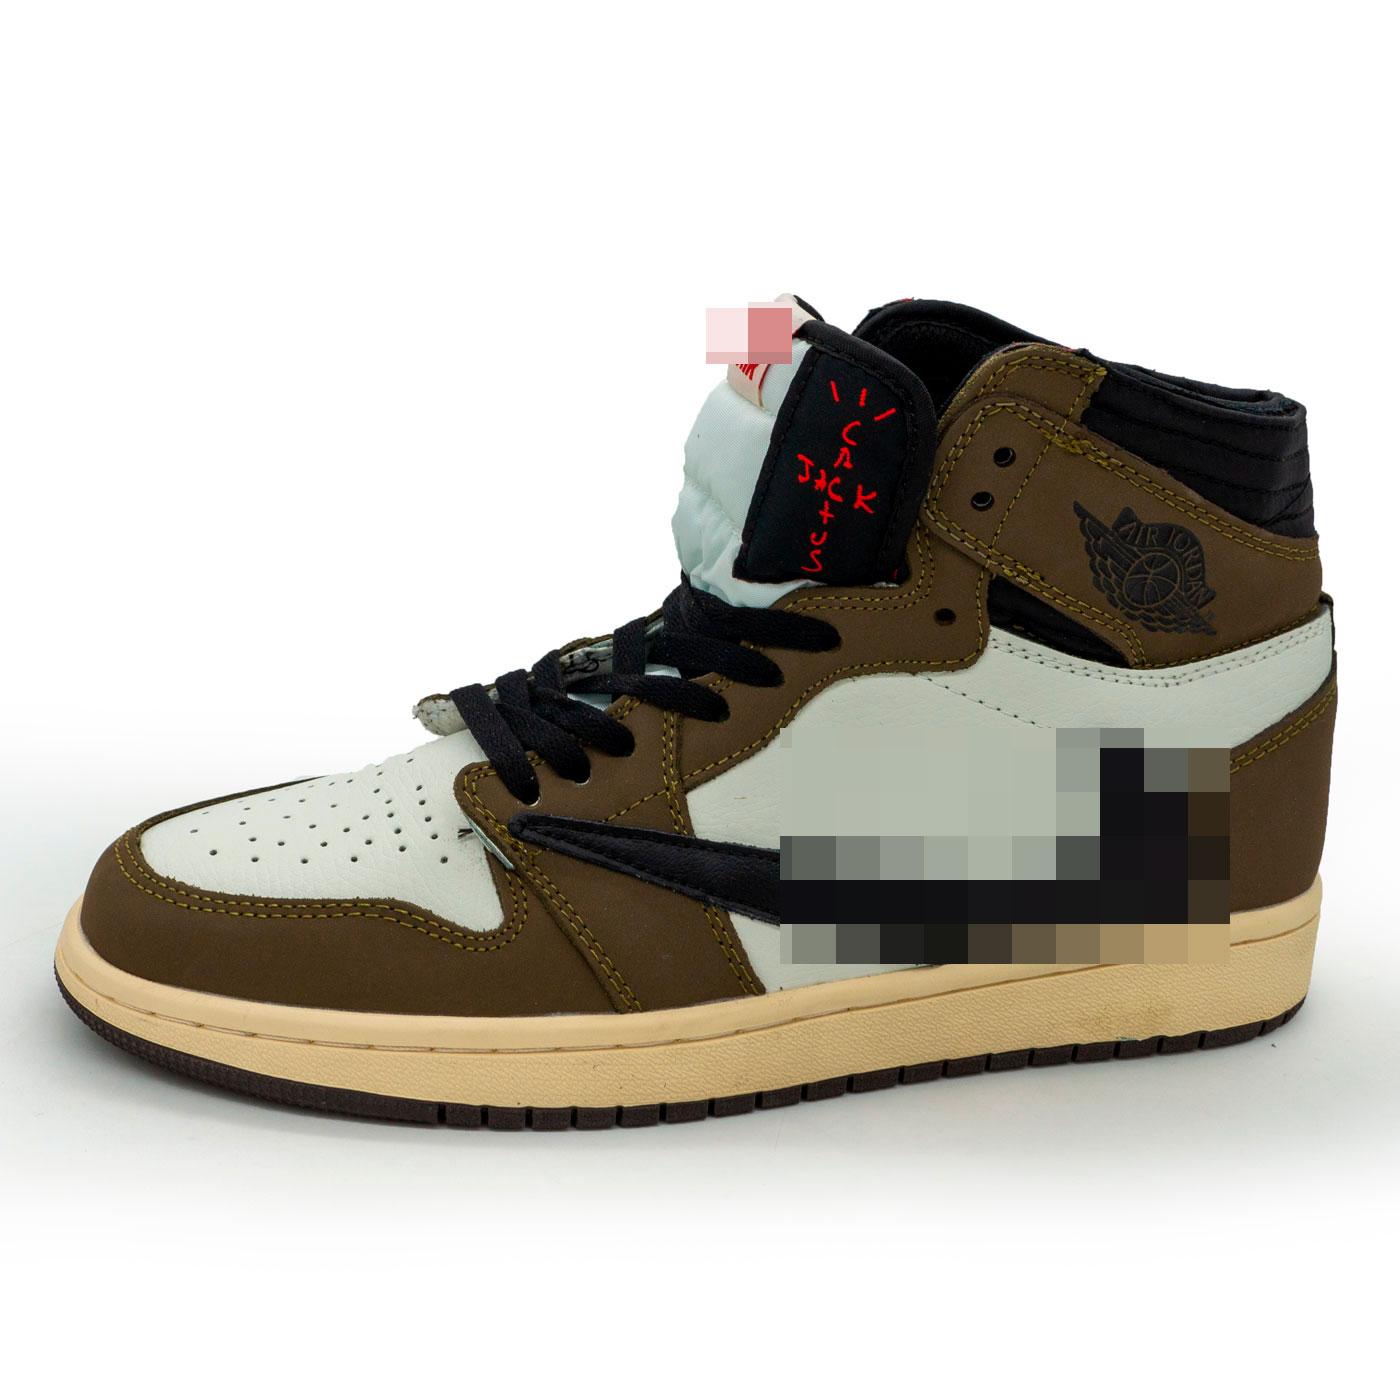 фото main Высокие кроссовки Nke Air Jordan 1 Jack Cactus хаки . Топ качество! main